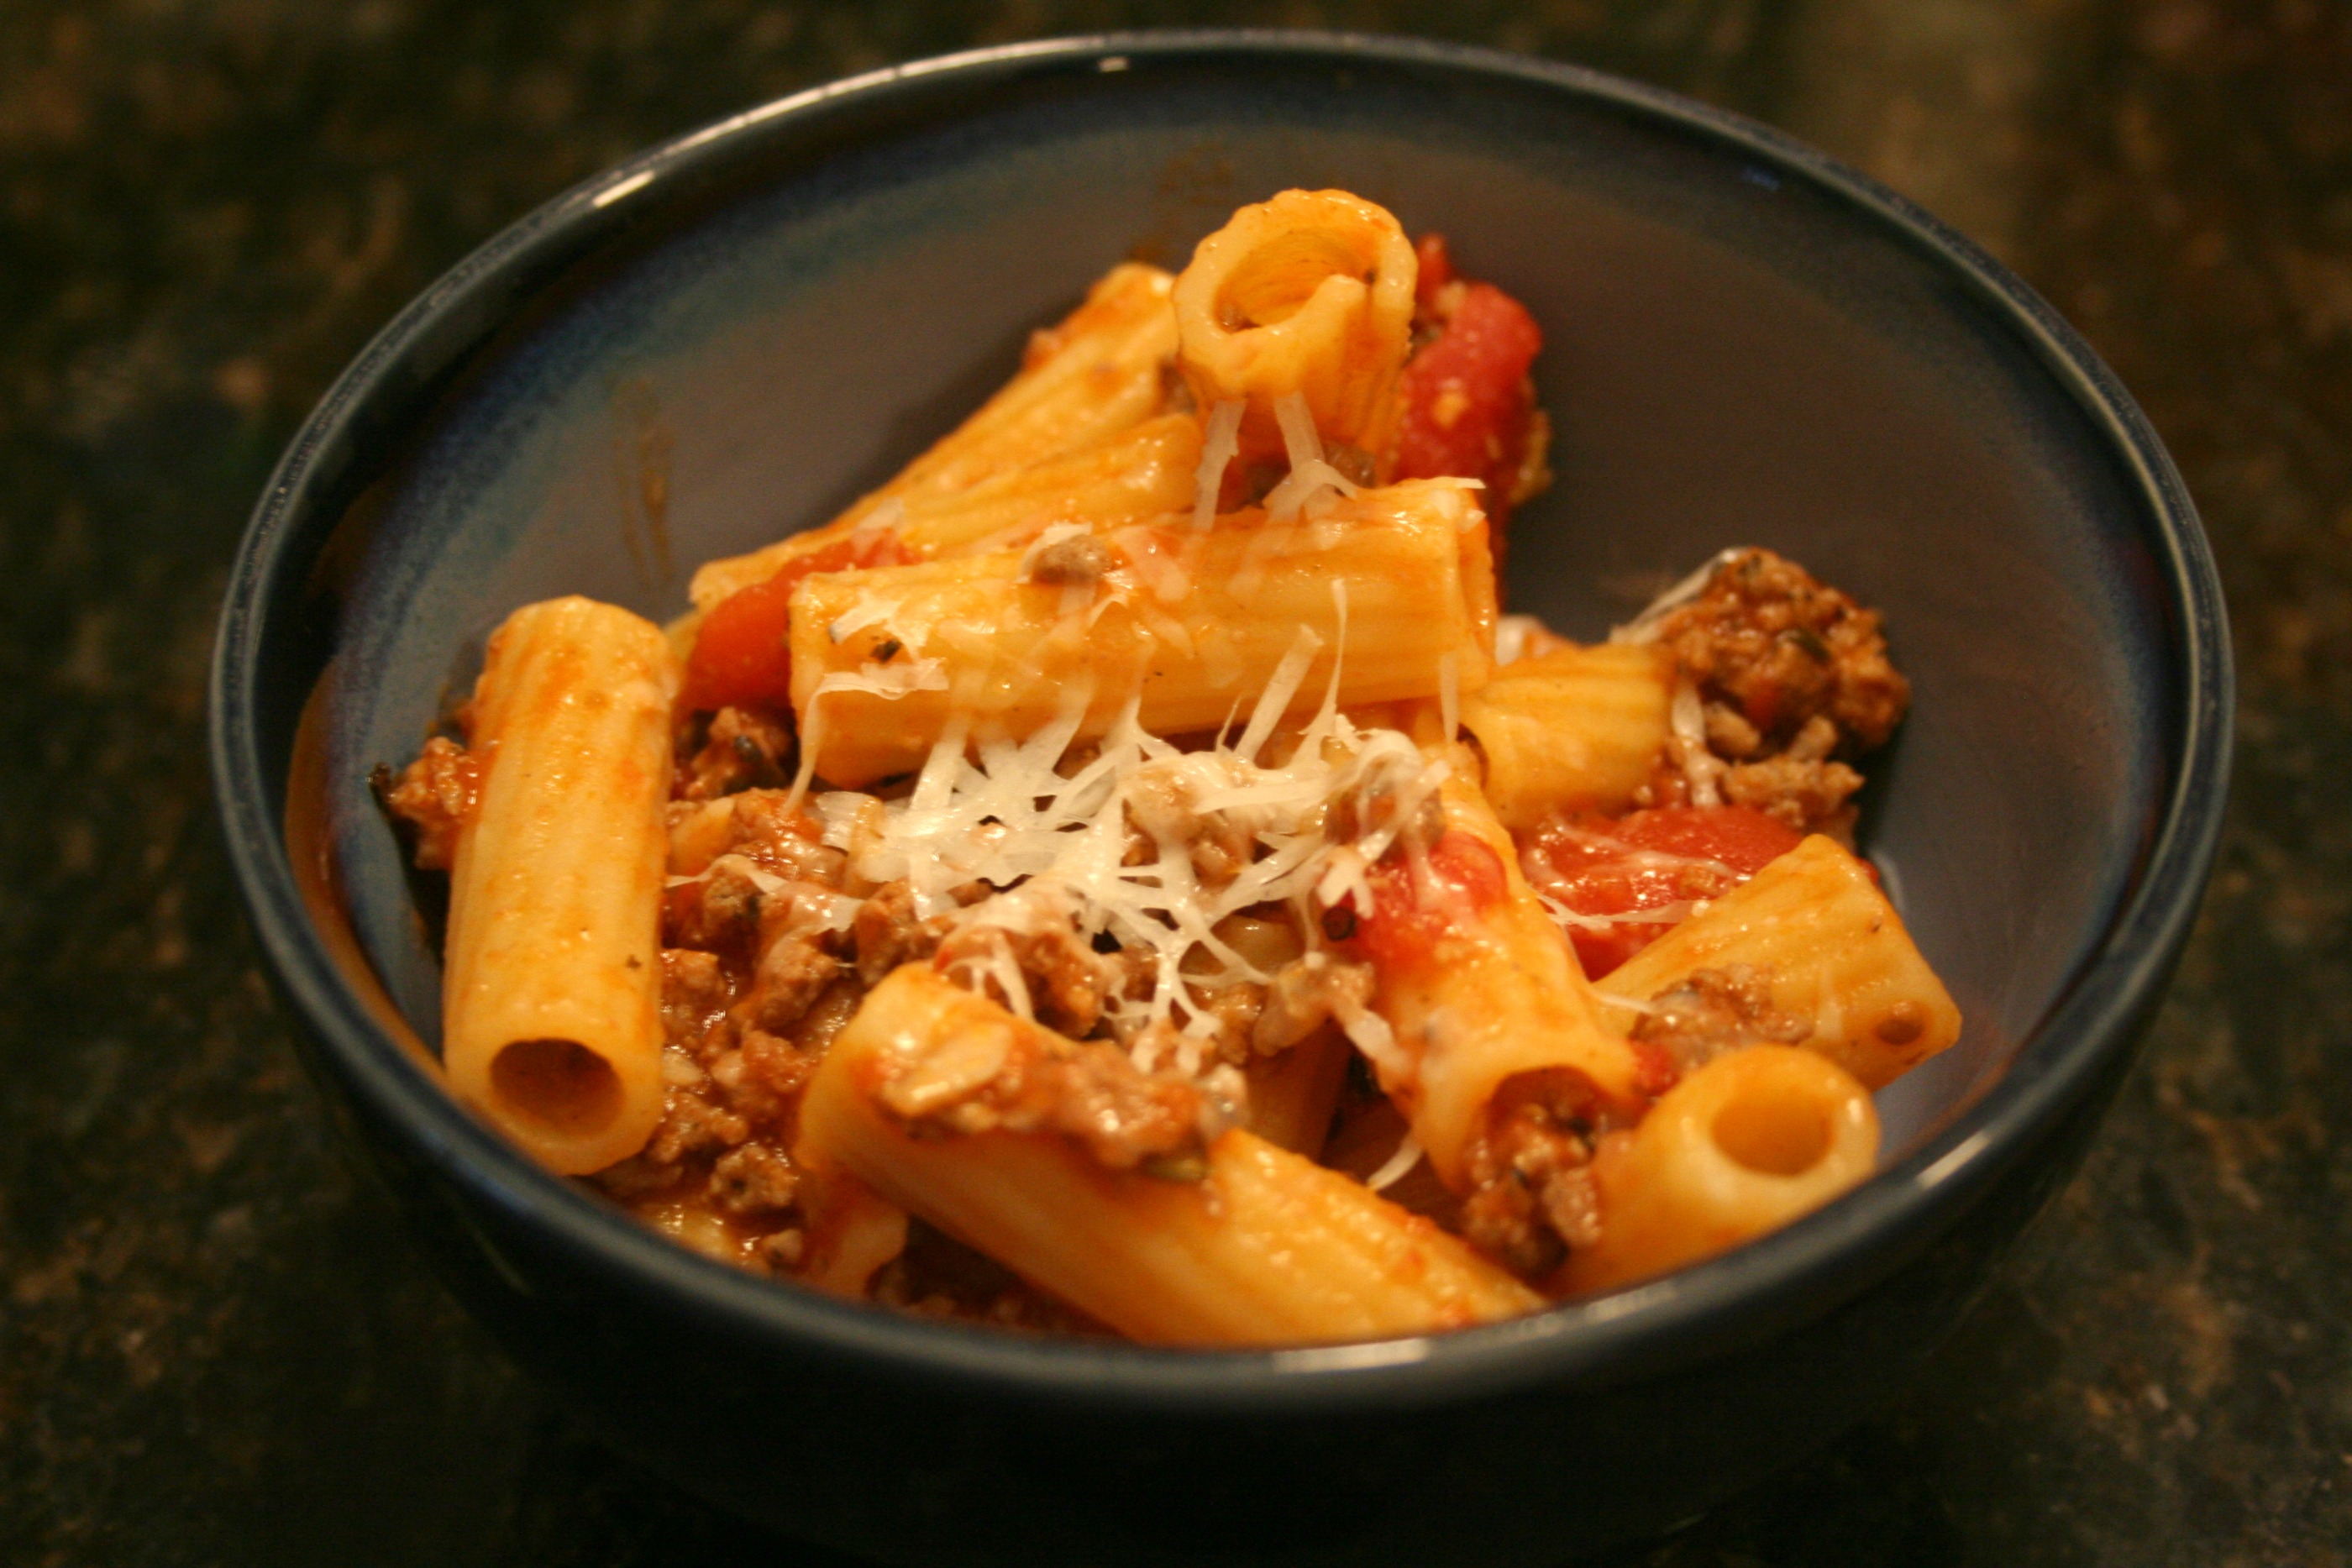 man pasta alla it was a great easy pasta pasta alla marlboro man pasta ...